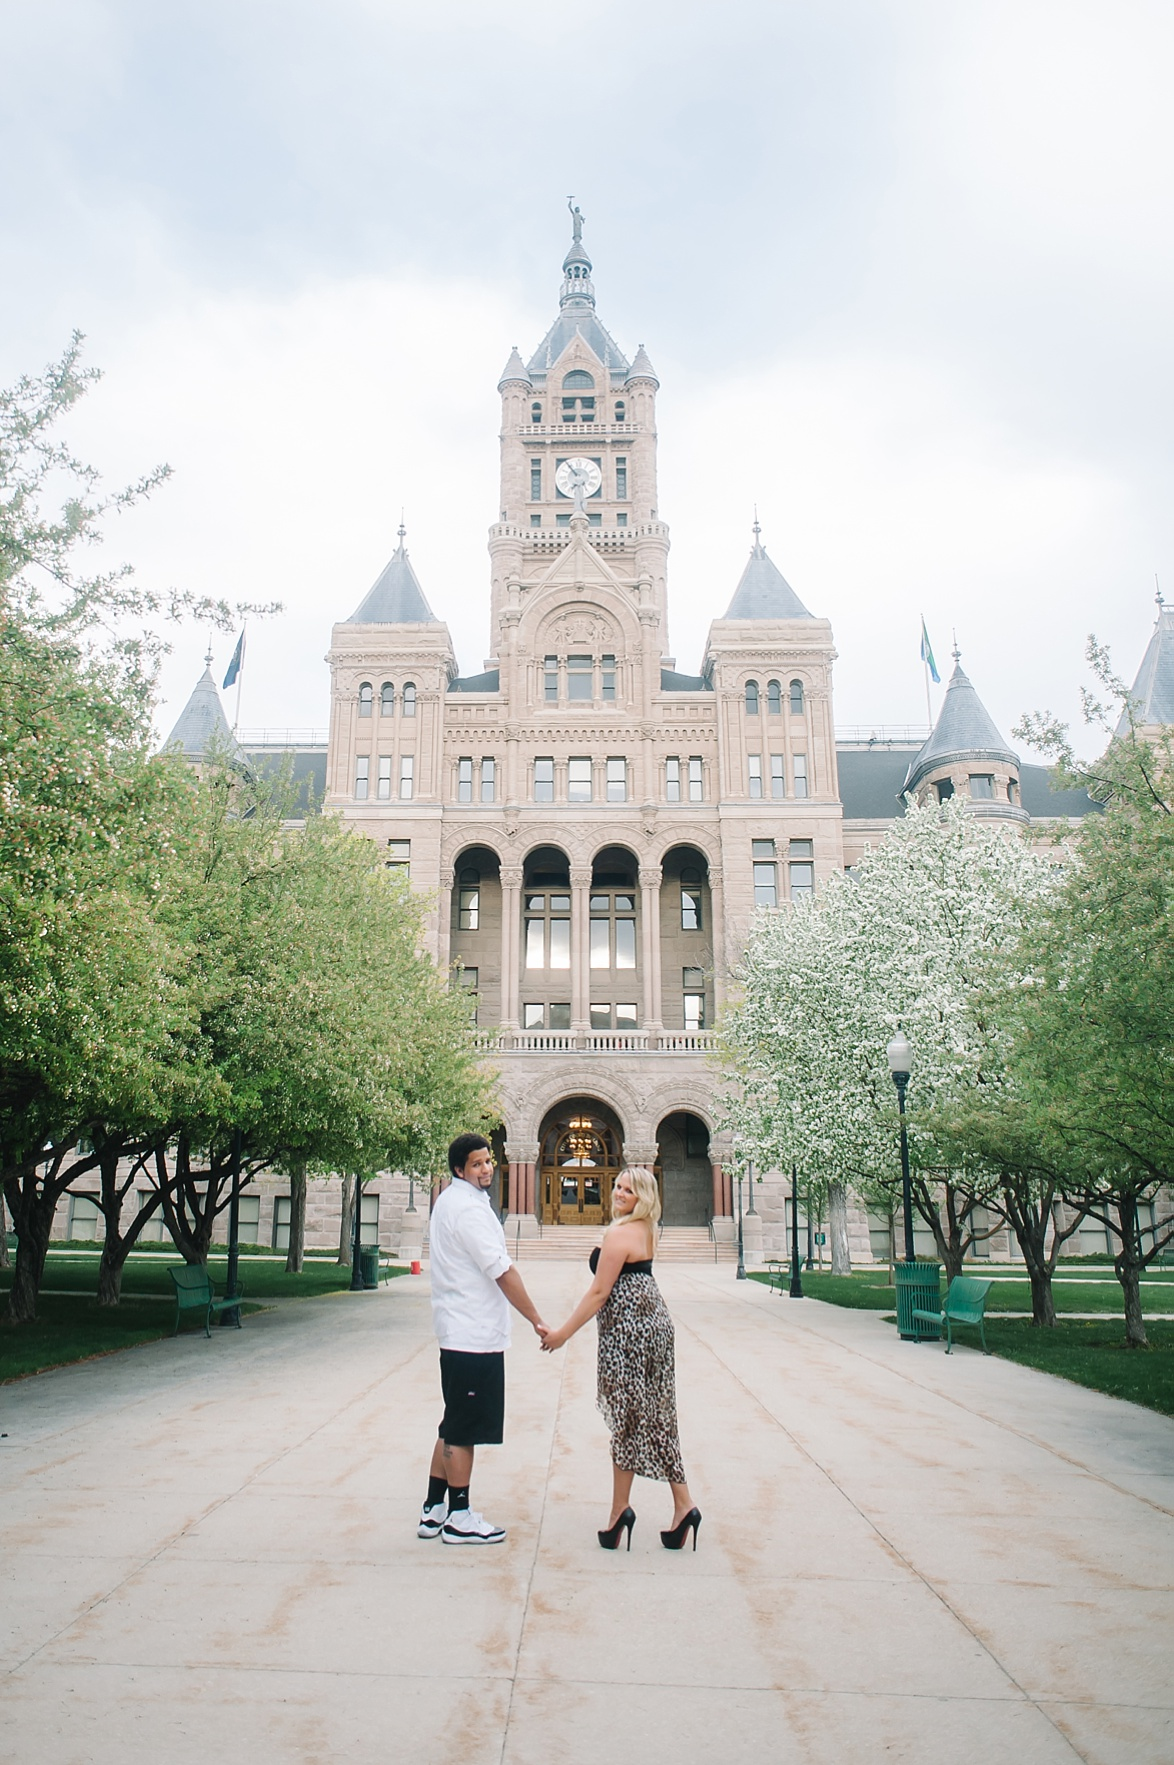 Salt Lake City Wedding Photography Engagement Ali Sumsion 018